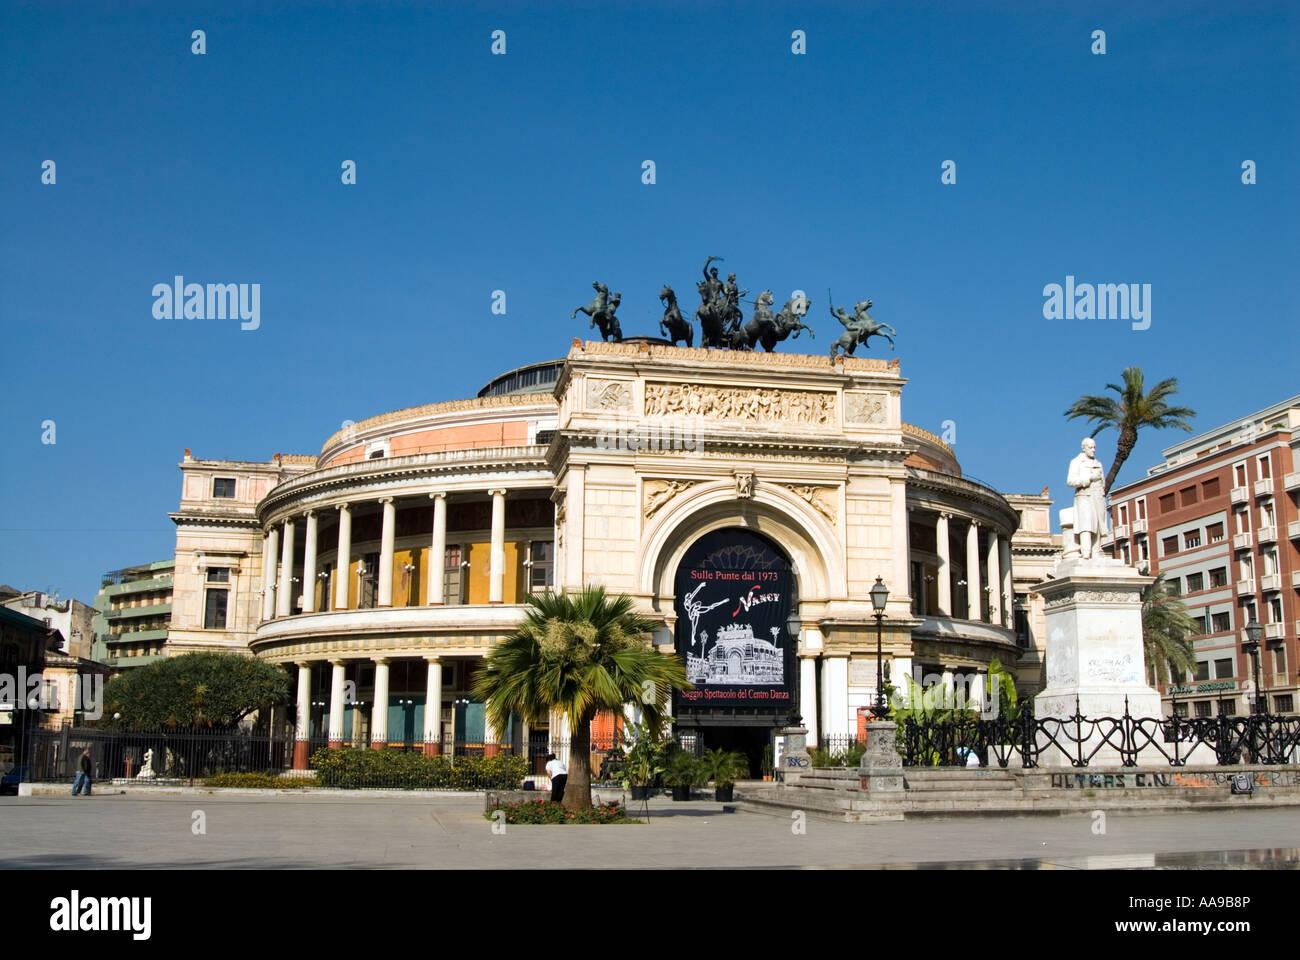 The Teatro Politeama Garibaldi Palermo Sicily Italy Stock Photo